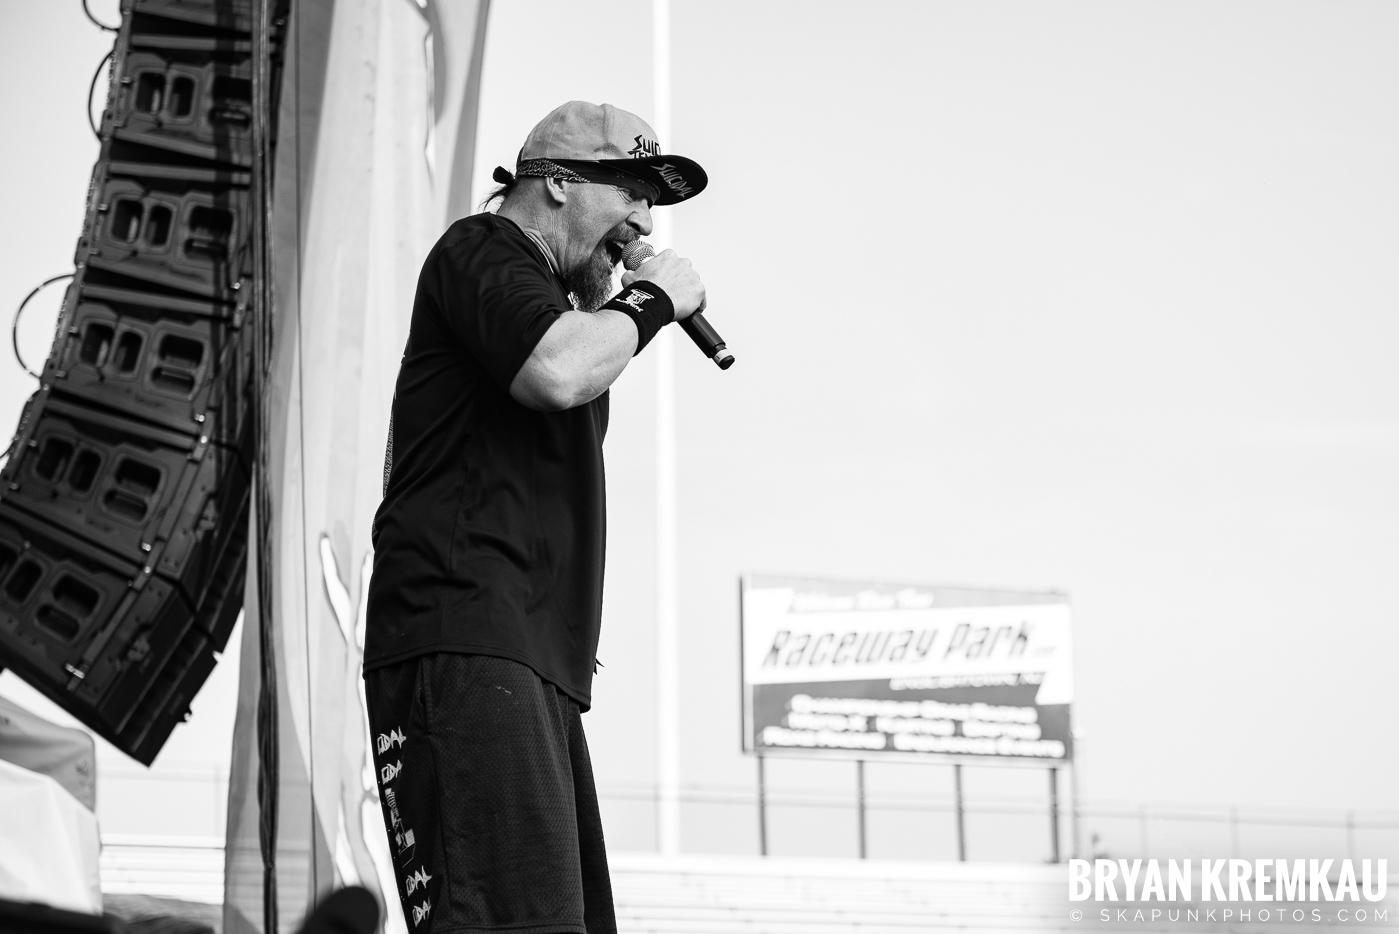 Suicidal Tendencies @ The Bash Music & Craft Beer Festival, Old Bridge Township Raceway Park, Englishtown, NJ - 6.2.19 (24)